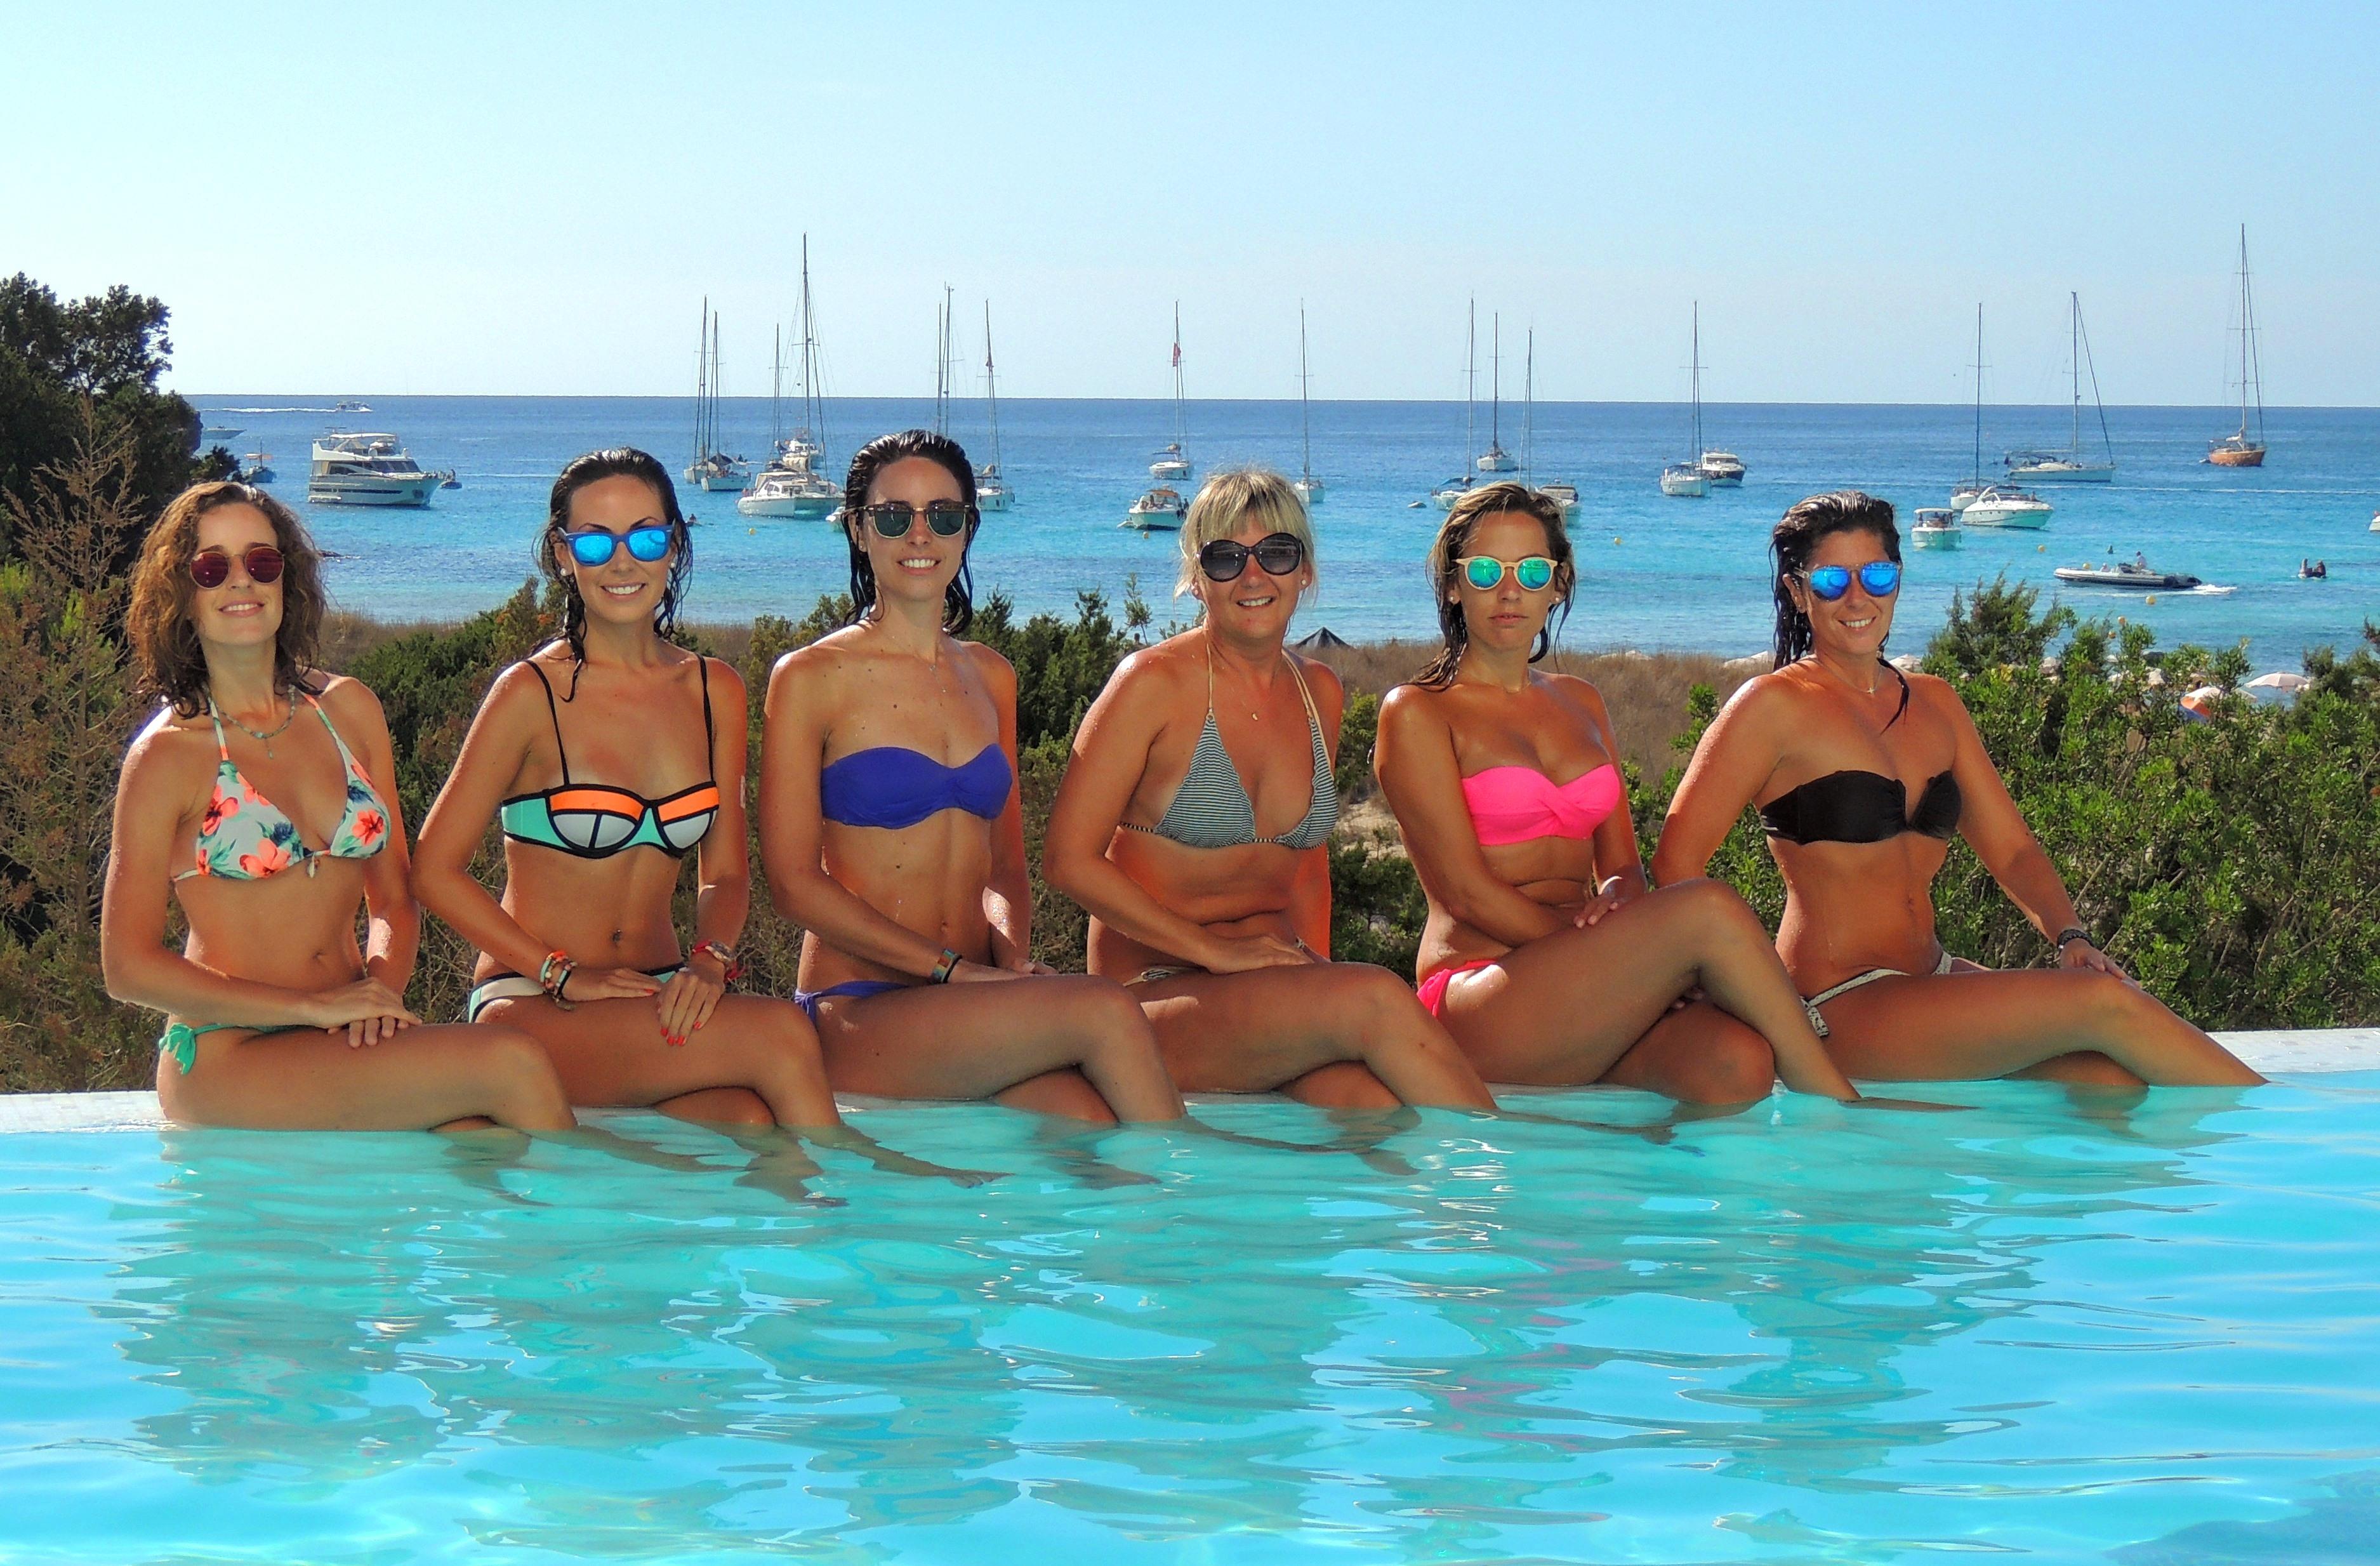 10 Things To Do in Formentera / 10 Cosas que Hacer en Formentera